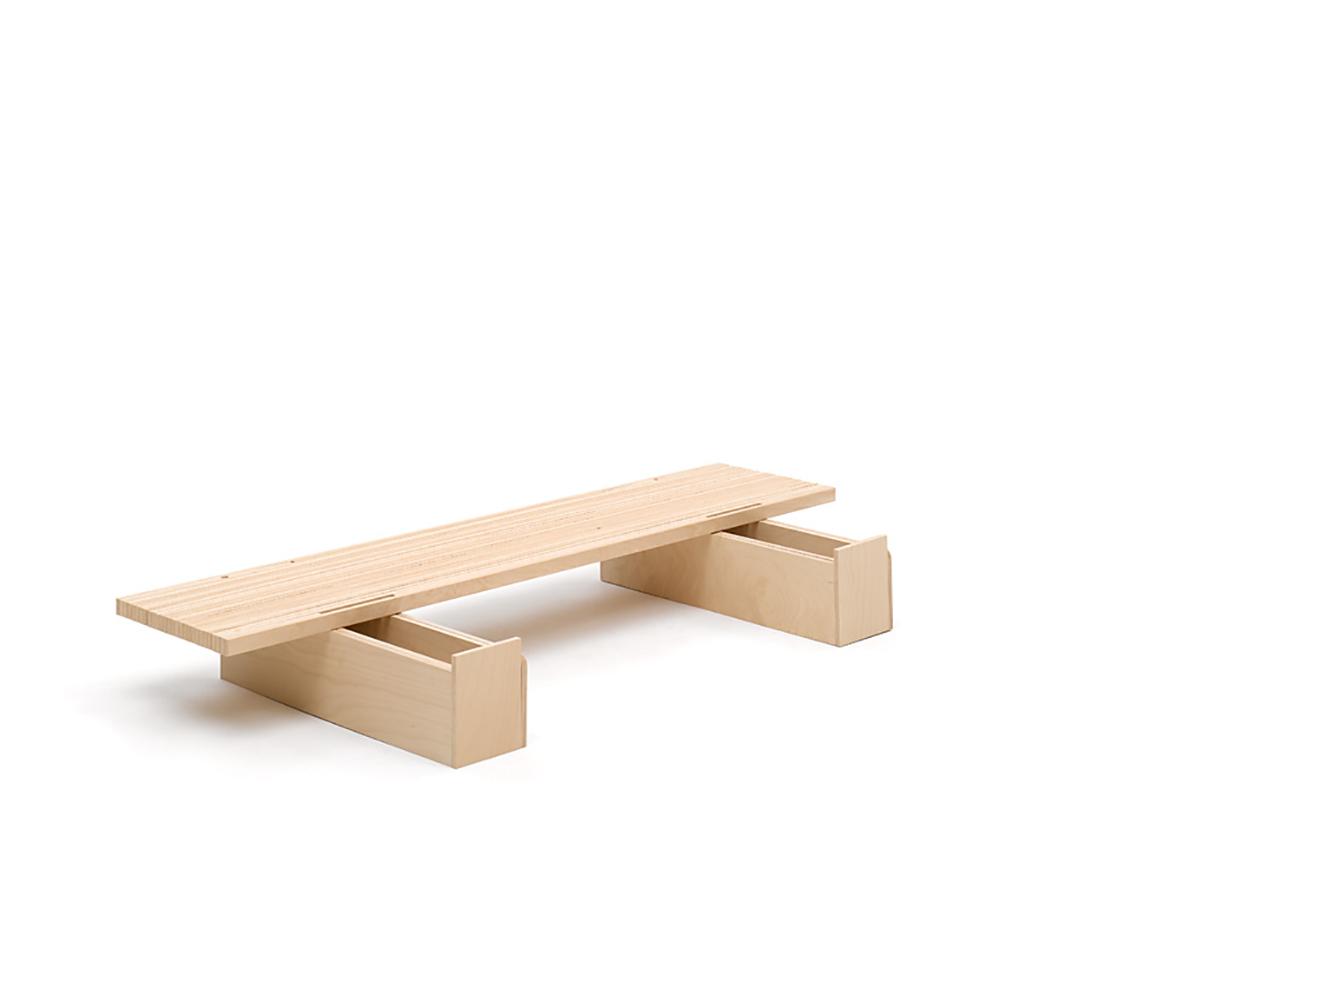 tojo v bett ein bett f r alle f lle wohnwerk berlin. Black Bedroom Furniture Sets. Home Design Ideas